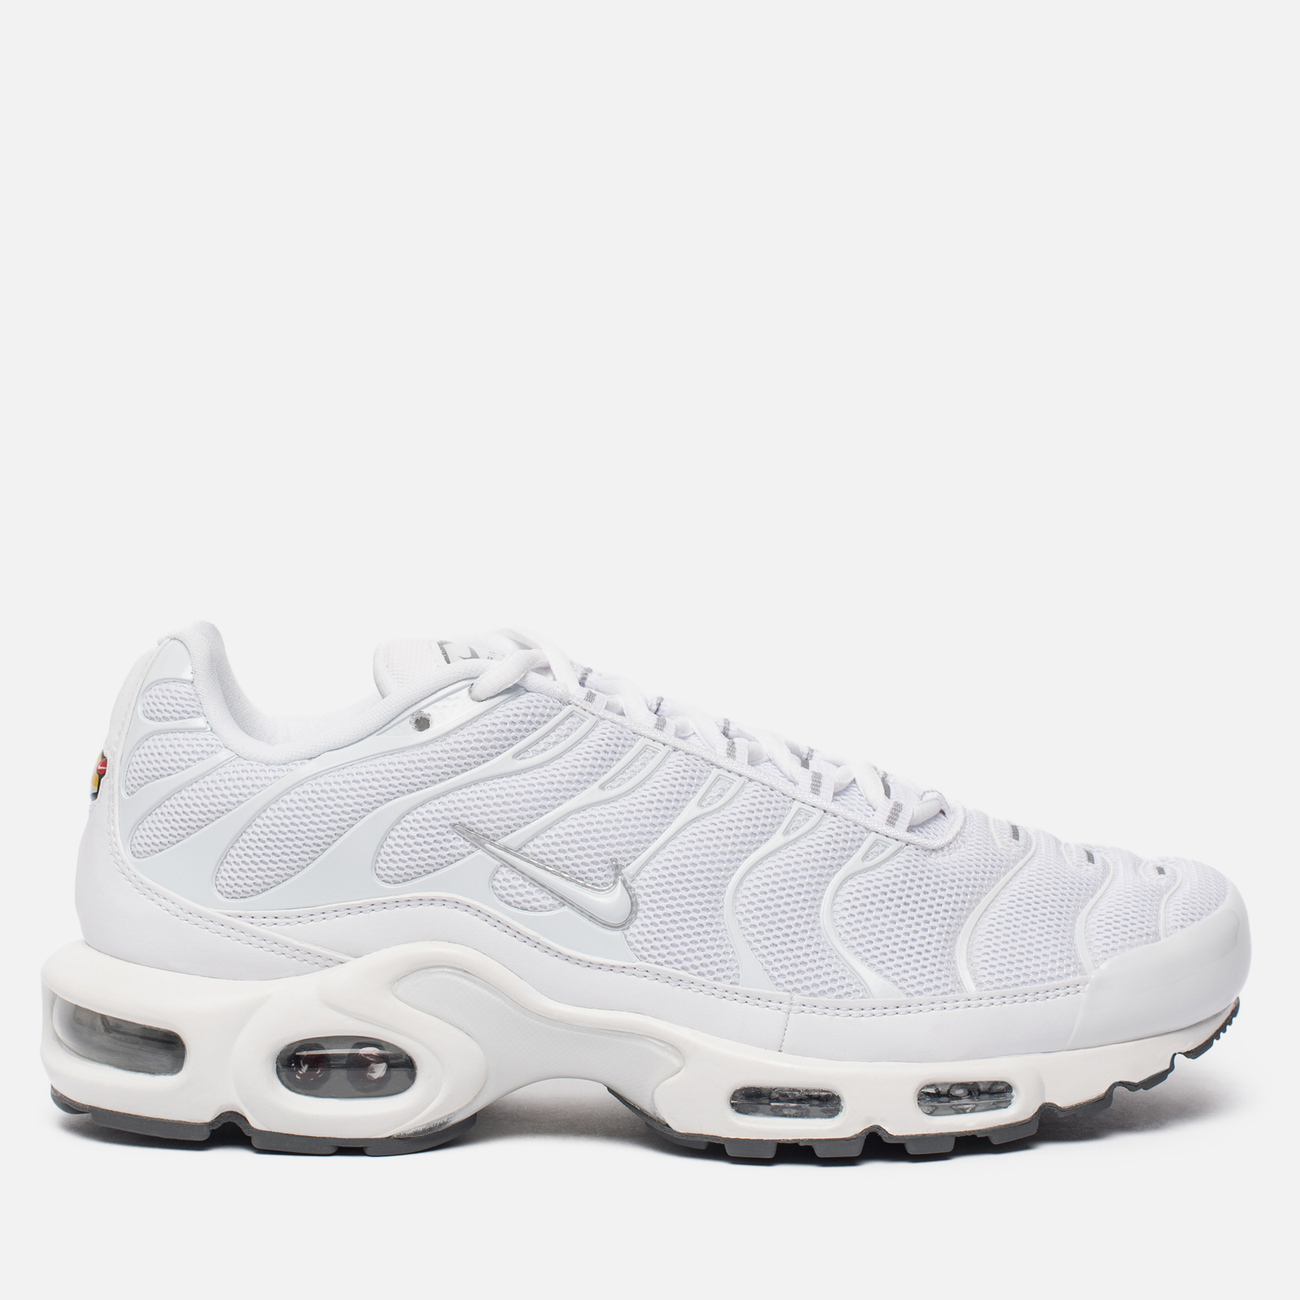 Мужские кроссовки Nike Air Max Plus Tuned 1 White/White/Black/Cool Grey